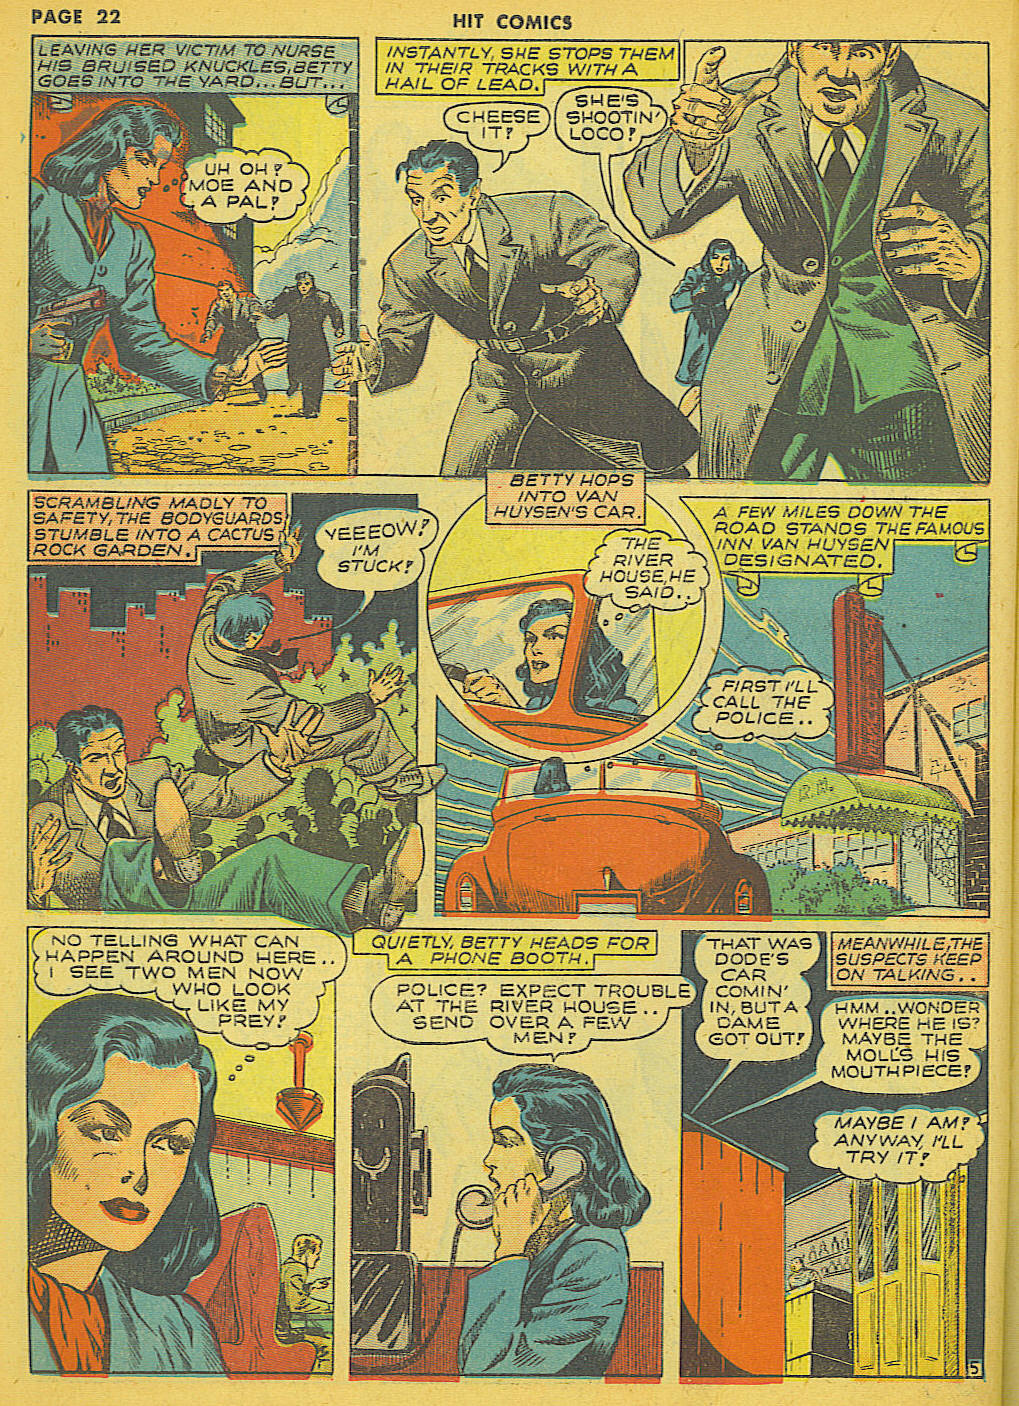 Read online Hit Comics comic -  Issue #21 - 24